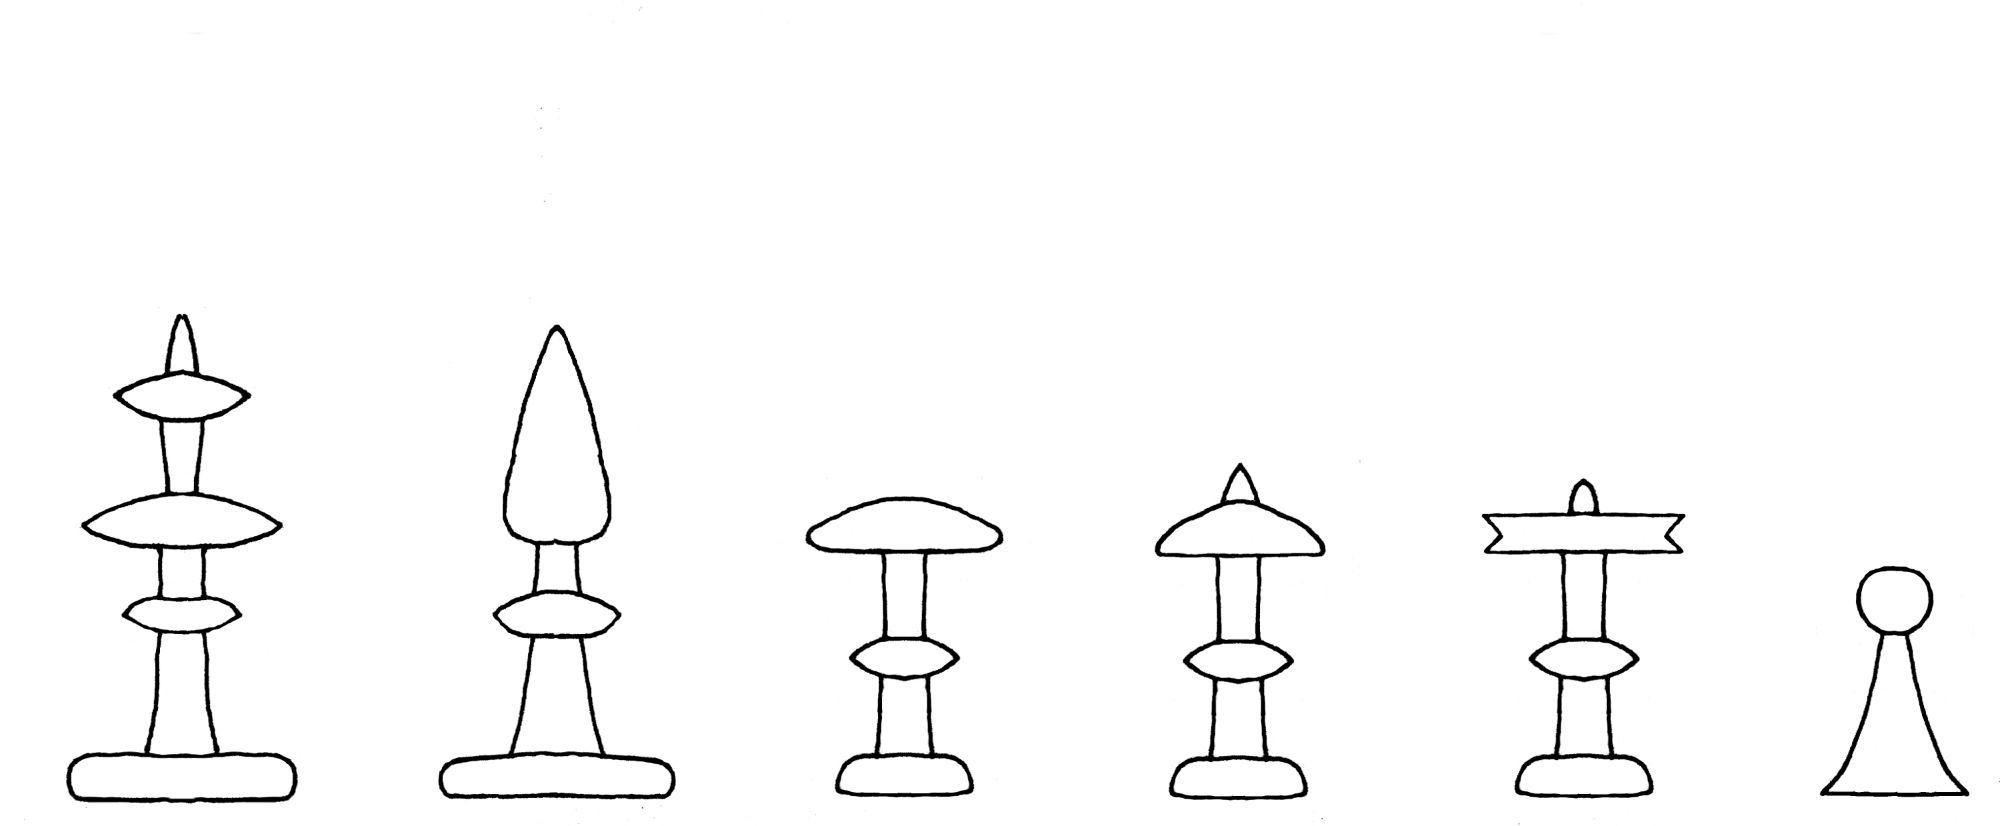 Pacioli chess set interpretive diagram